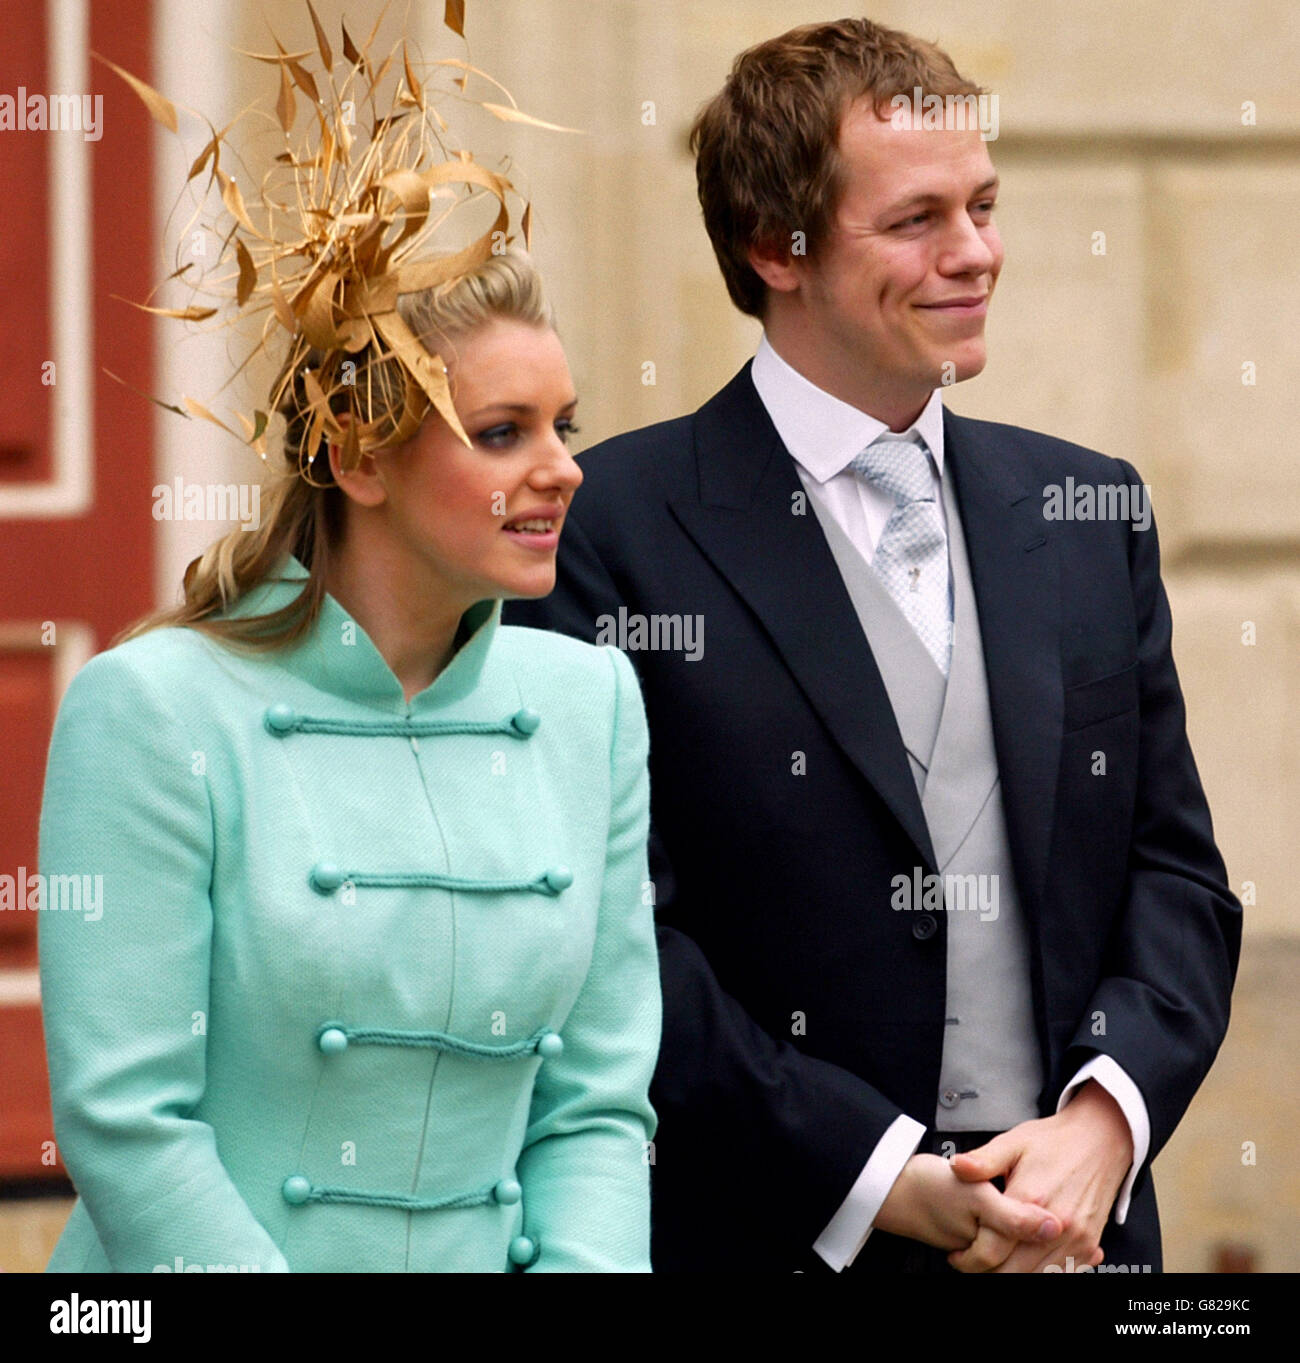 Royal Wedding - Marriage of Prince Charles and Camilla Parker Bowles ...